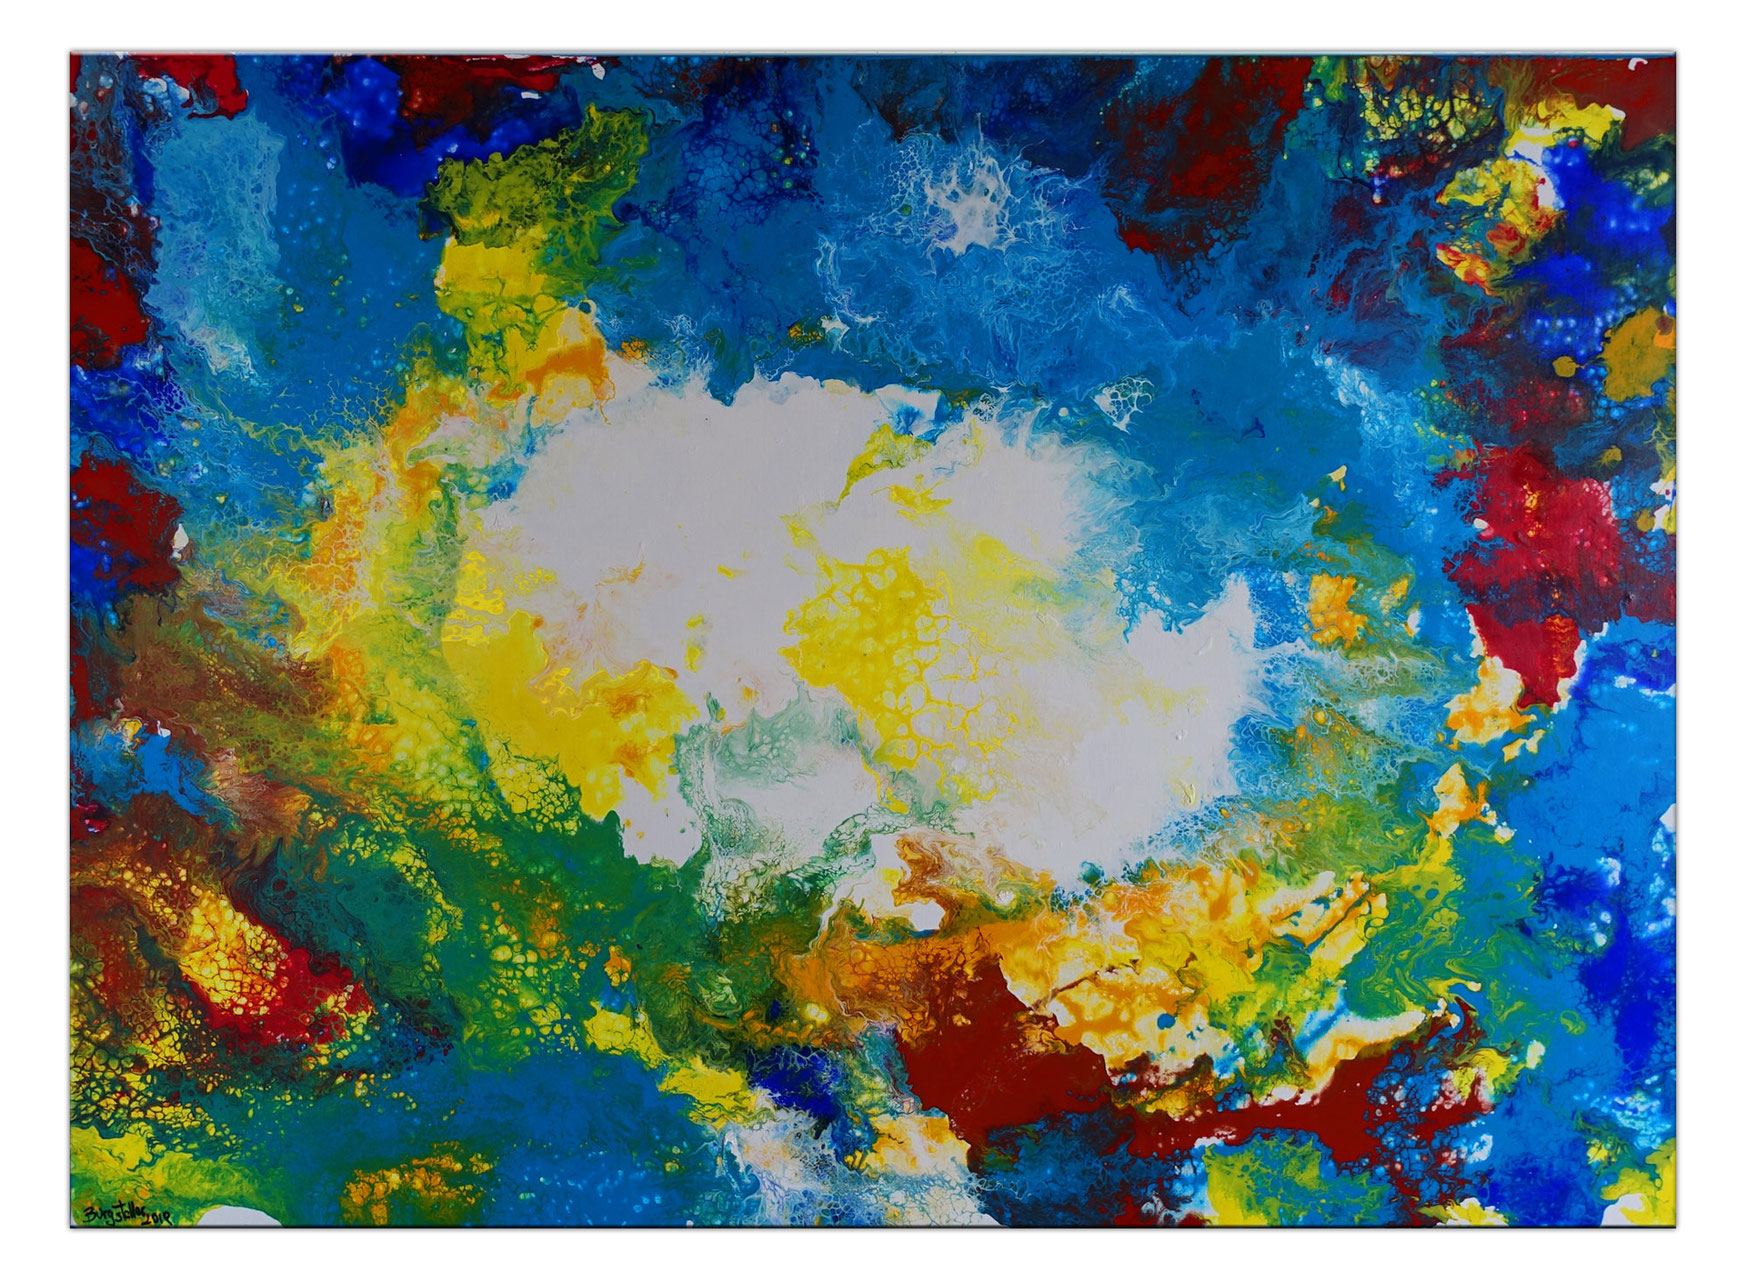 Ursprung Abstrakte Kunst Malerei Blau Gelb Wandbild Burgstaller